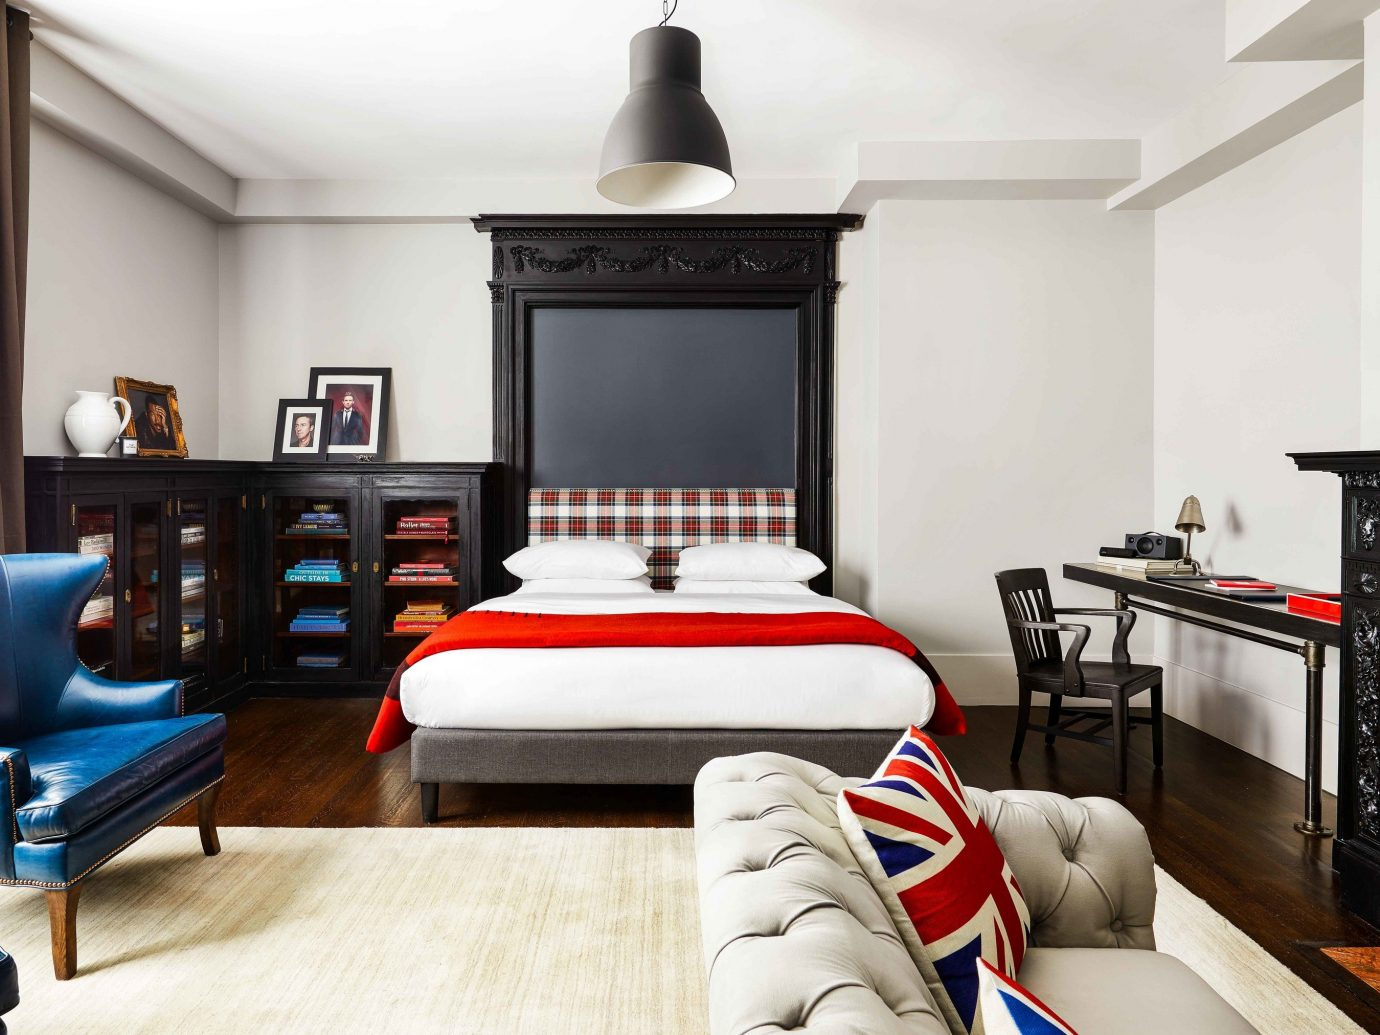 Boutique Hotels Hotels Influencers + Tastemakers Romantic Hotels Style + Design indoor sofa Living wall floor room interior design furniture living room interior designer Modern flat leather